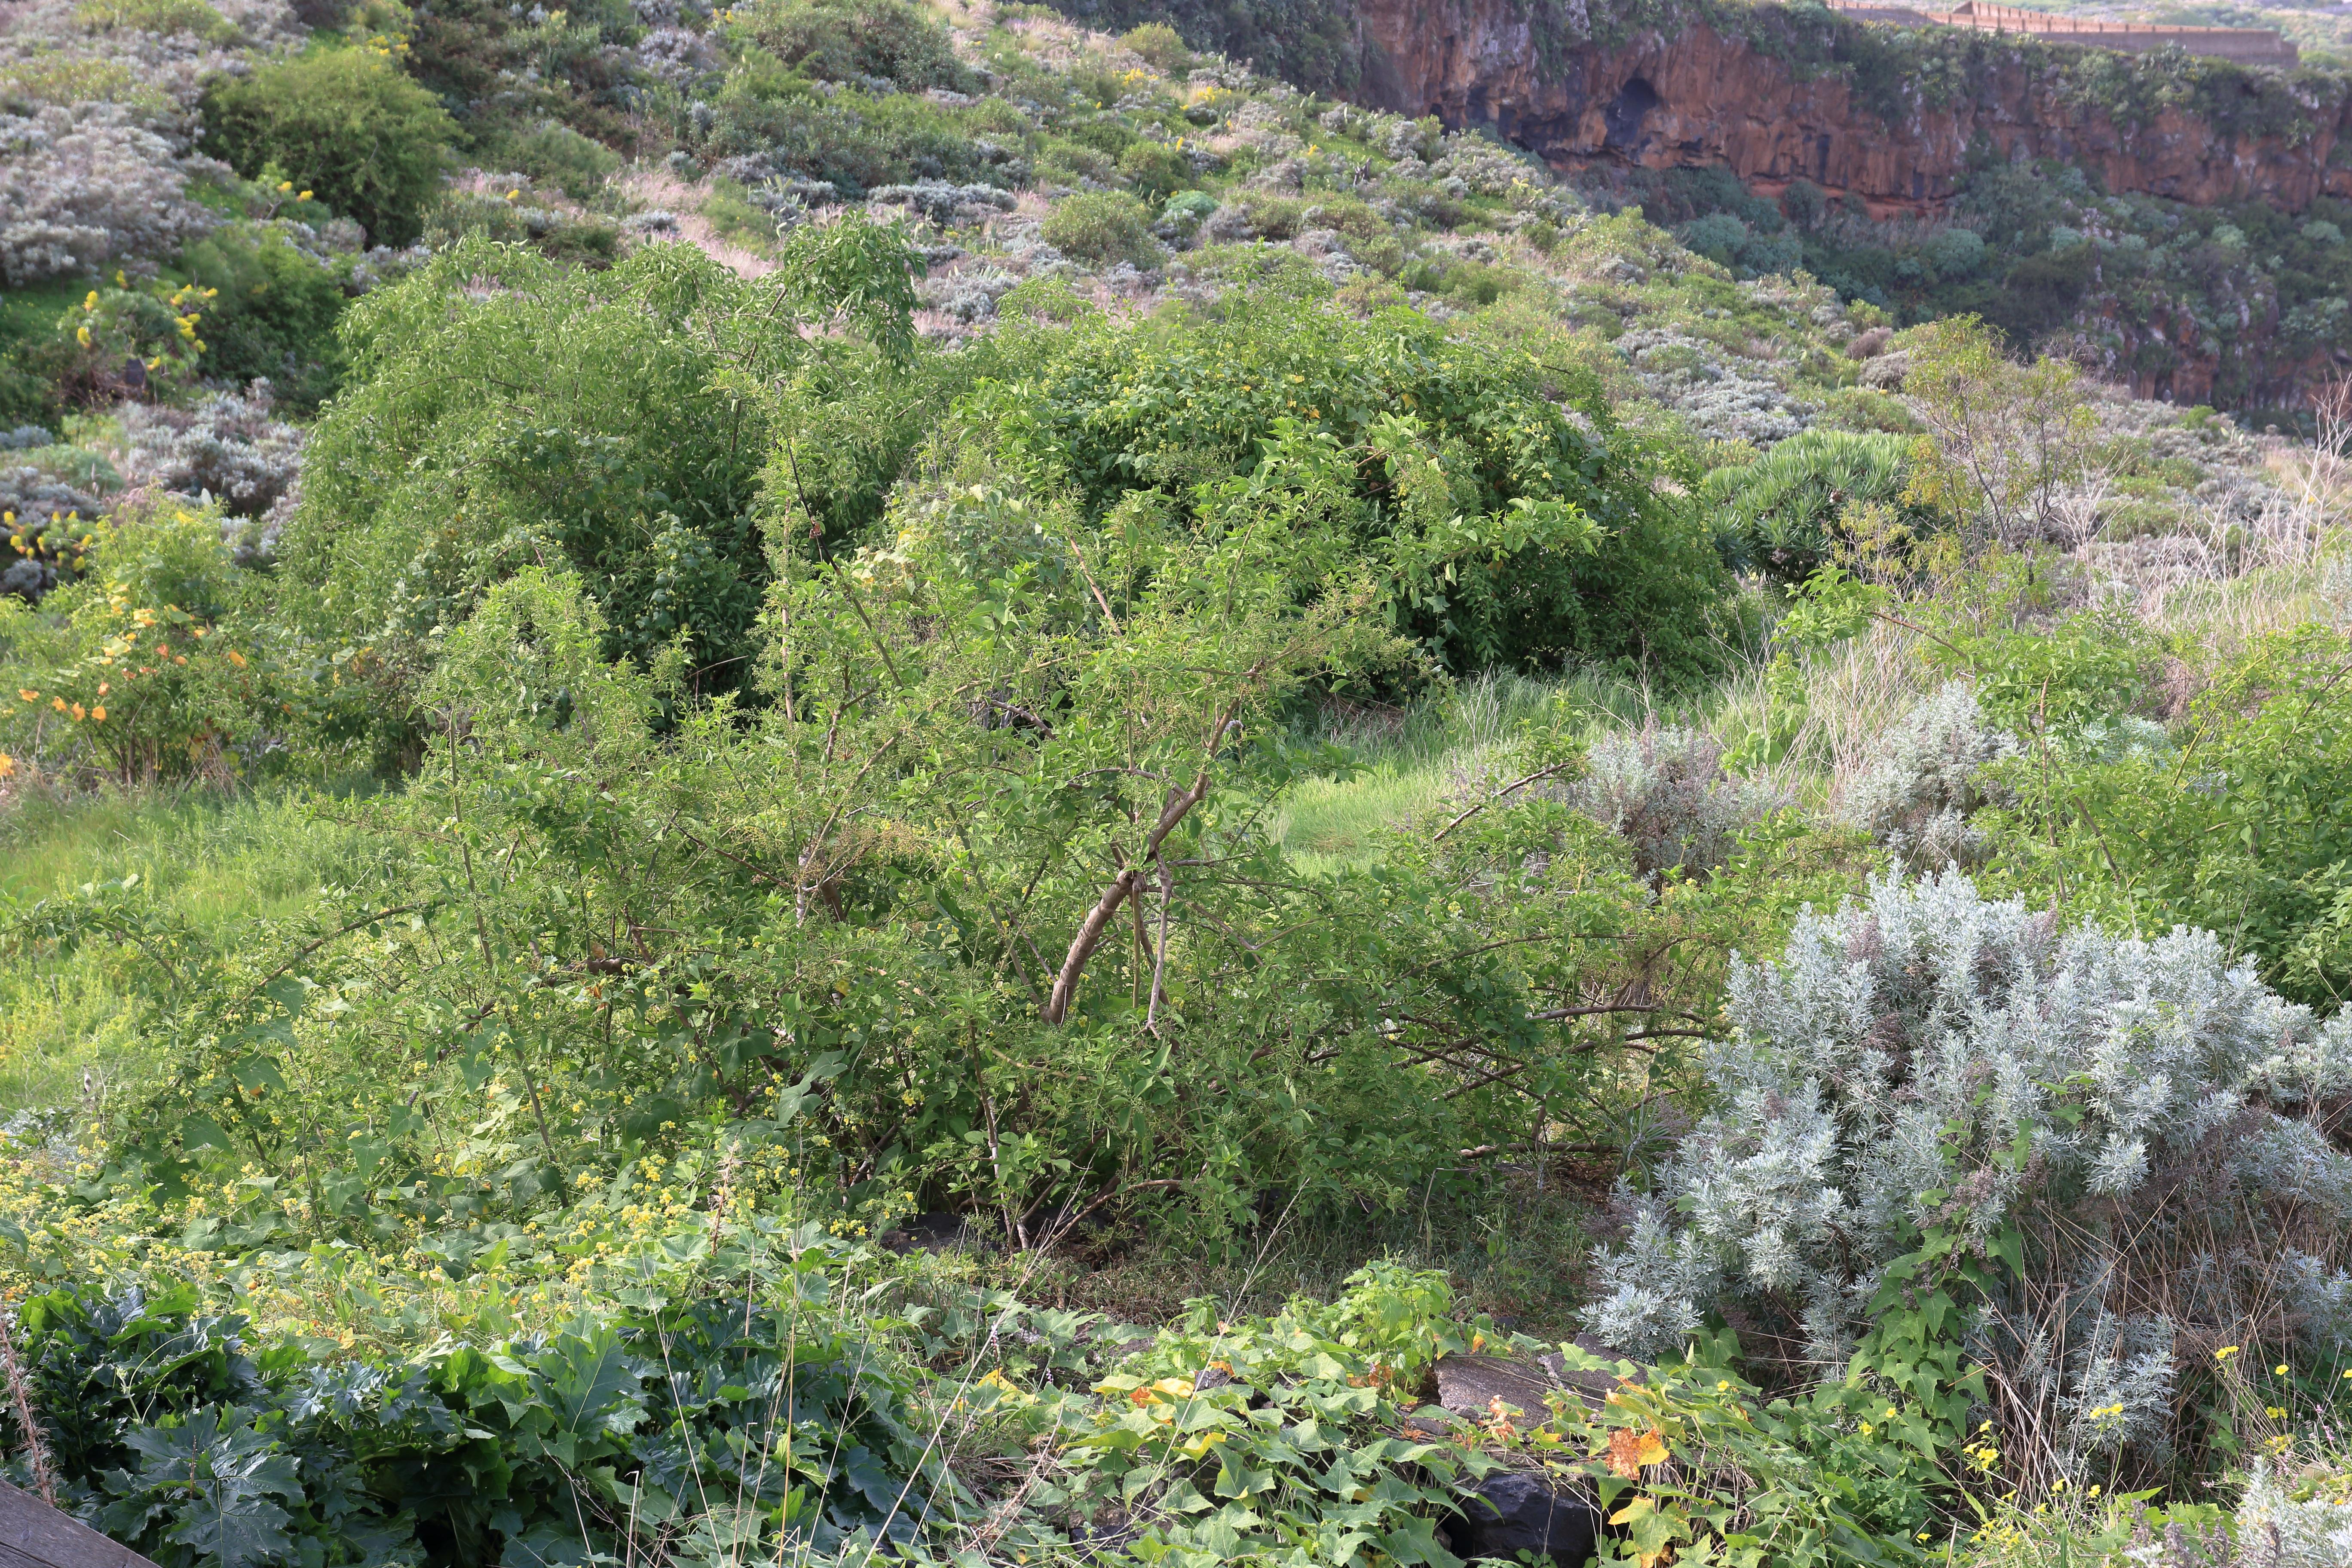 img_0166-bosea-yervamora-habitat-a-10.jpg